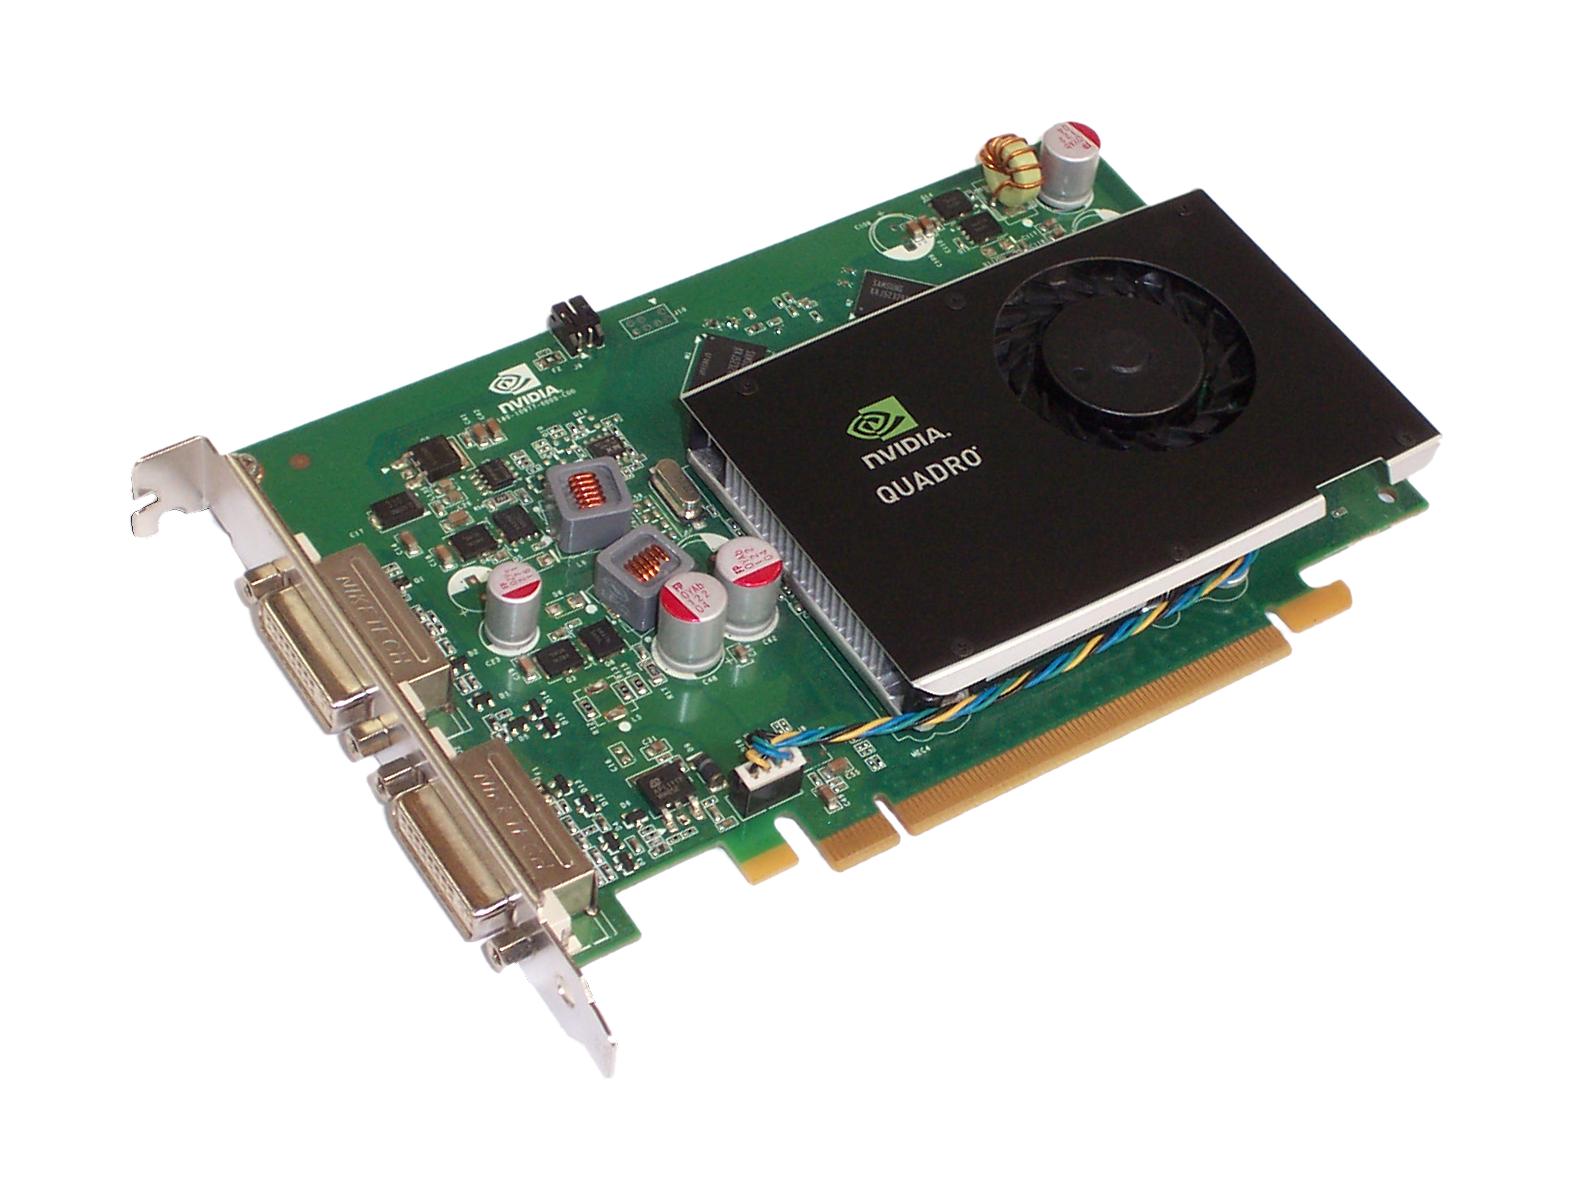 HP 519294-001 nVidia Quadro FX 380 256MB PCIe Dual DVI Graphics Card